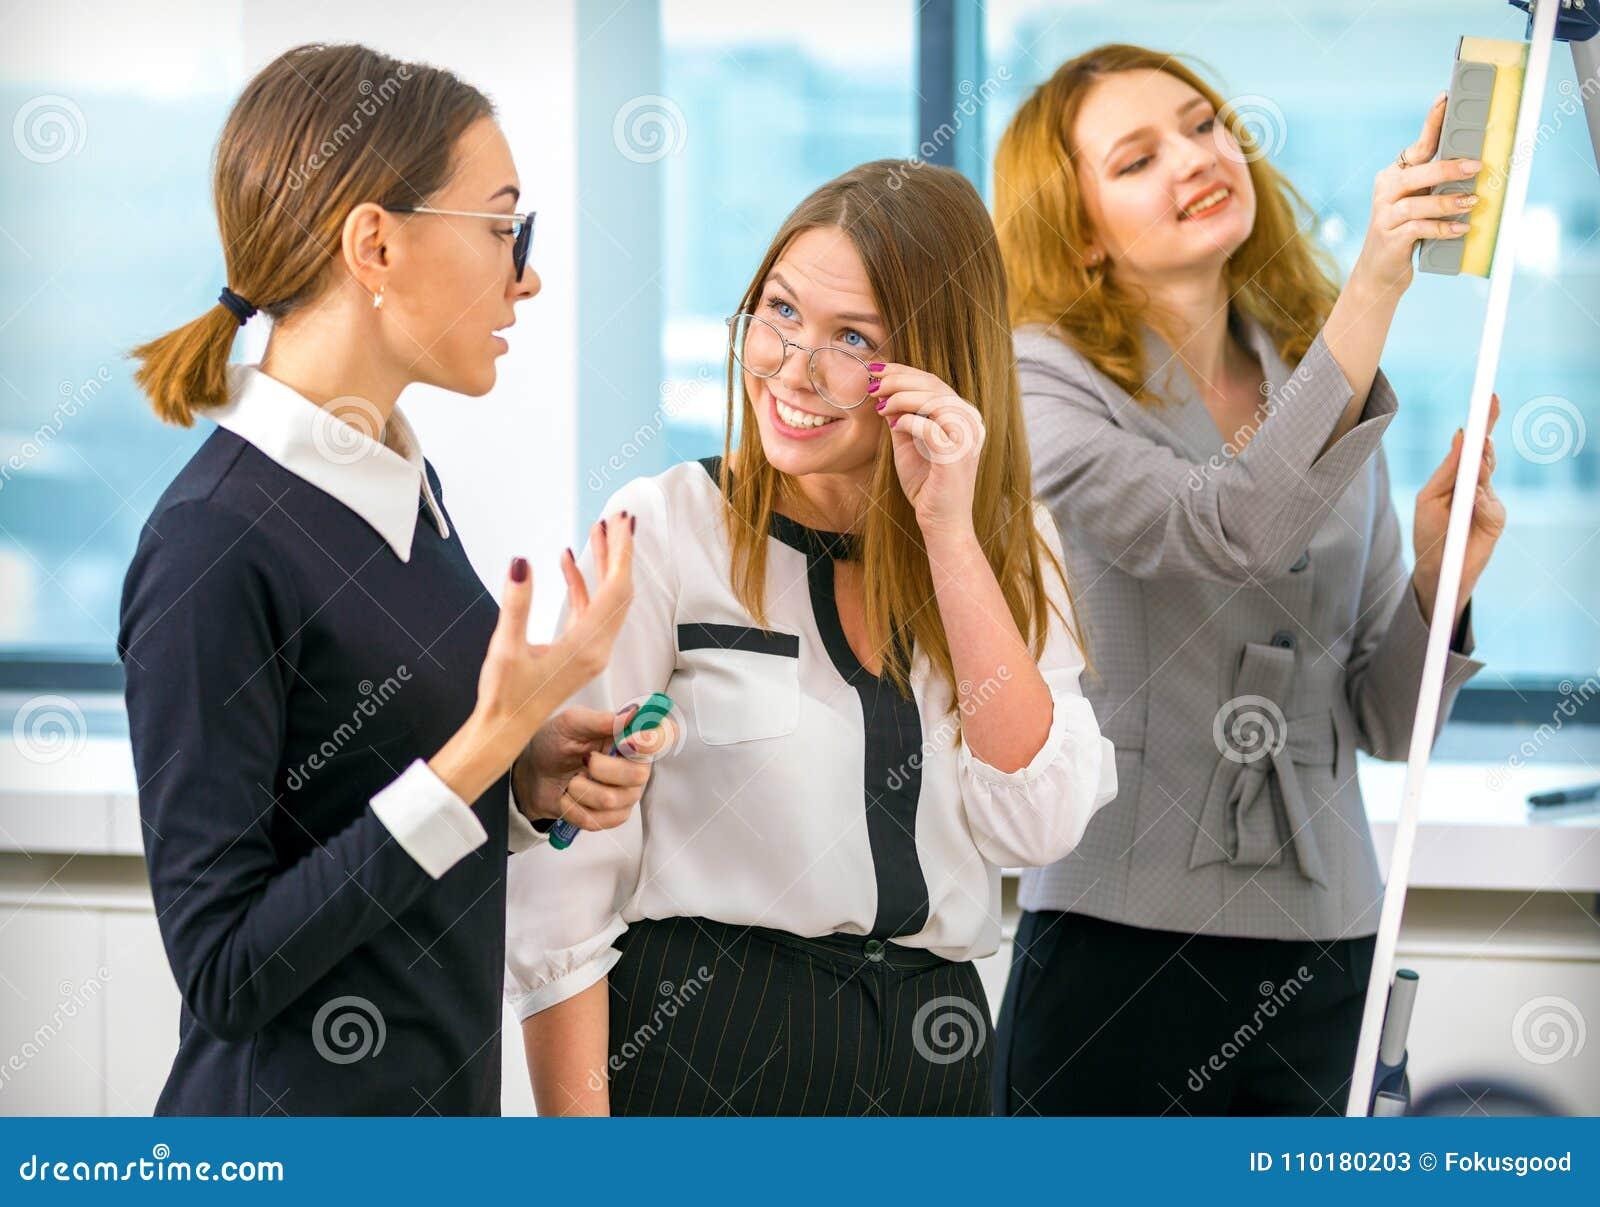 Девушки на работе в офисах подіум полтава